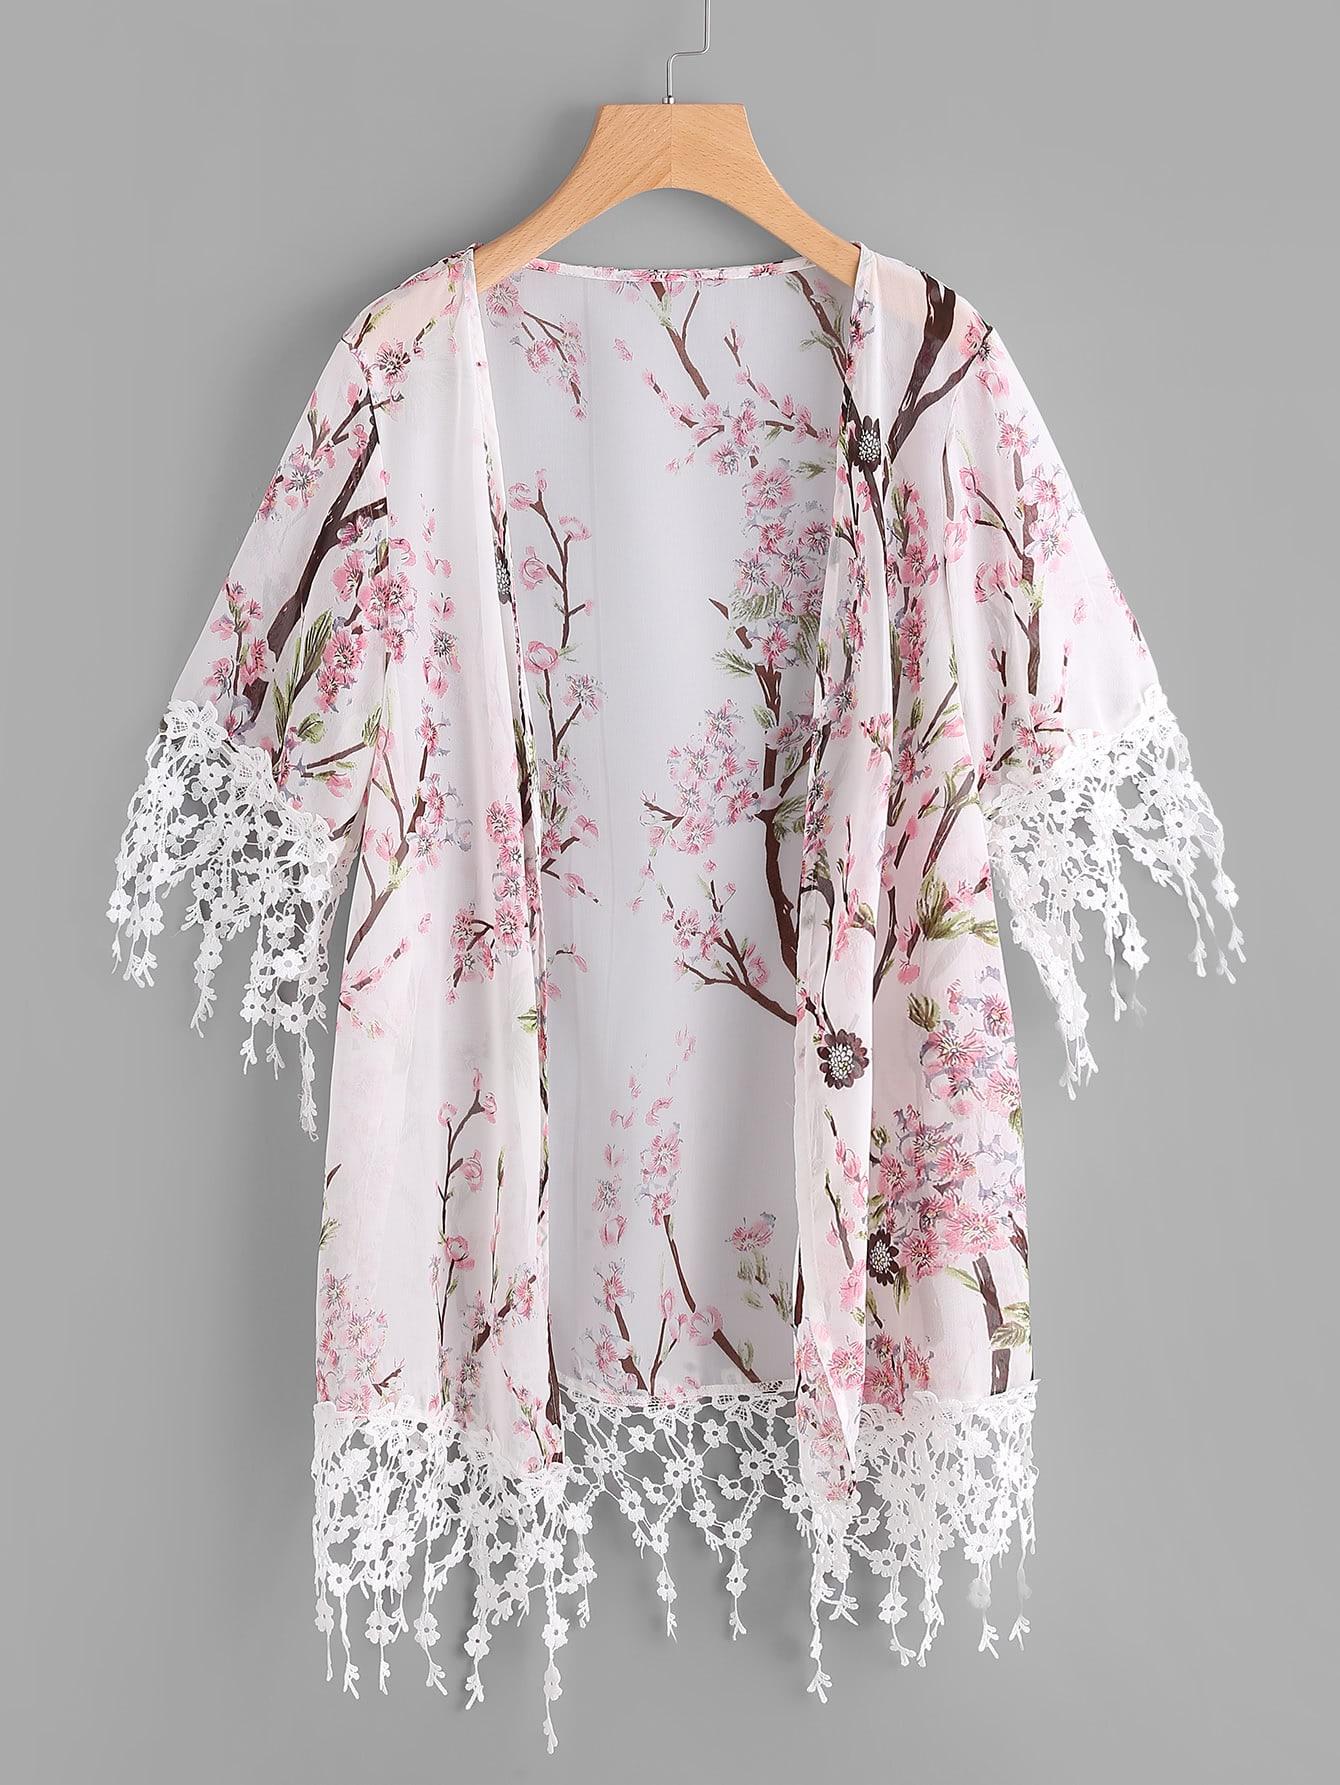 Image of Blossom Print Floral Lace Trim Kimono